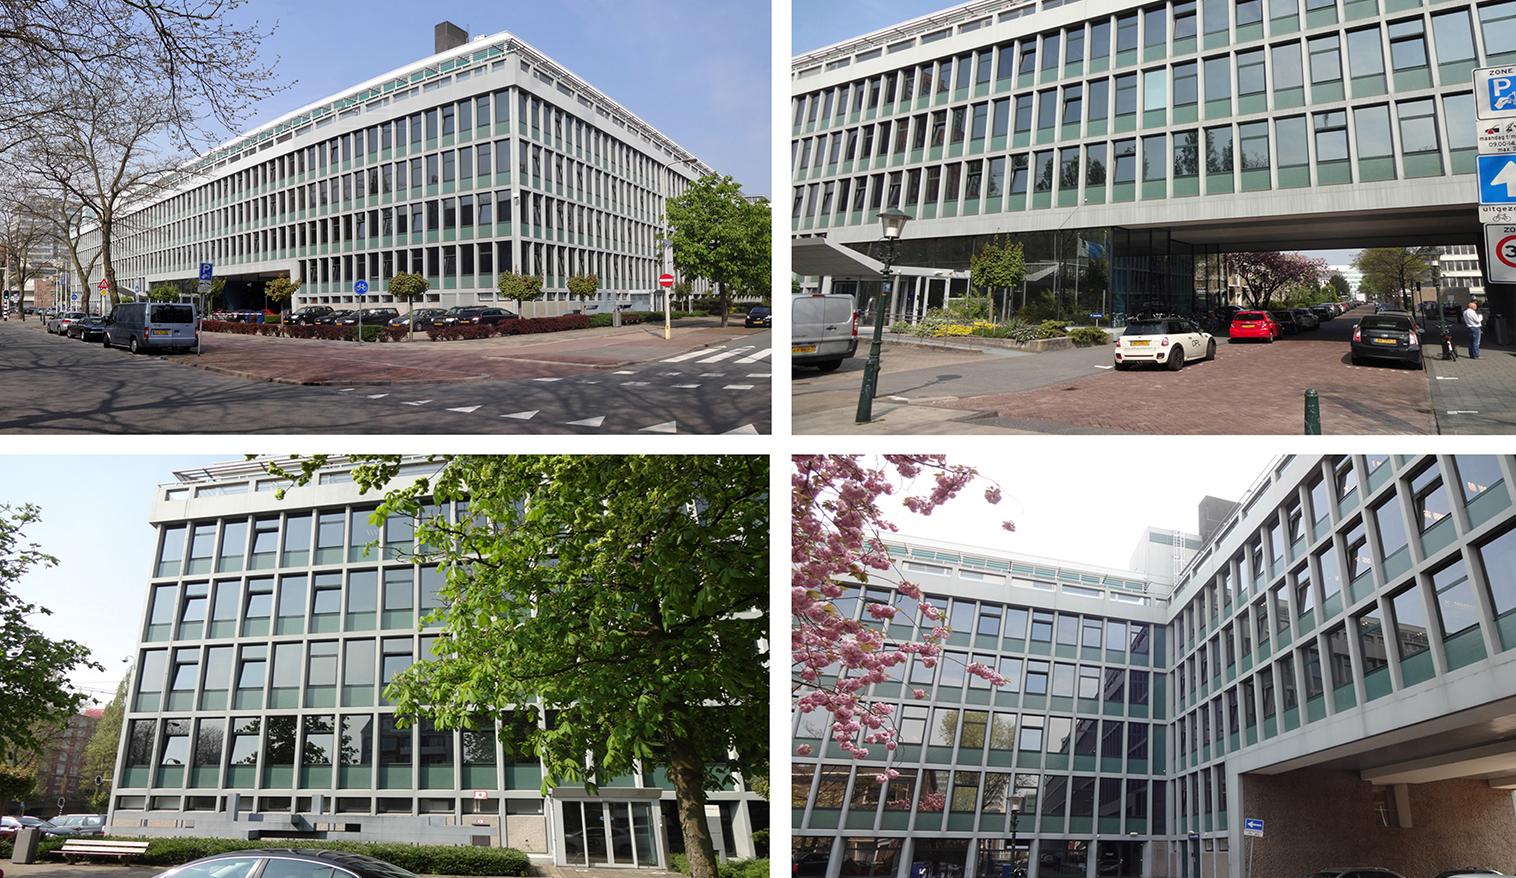 04 OPL Architecten_Woningen Bezuidenhout-1516×878-72dpi